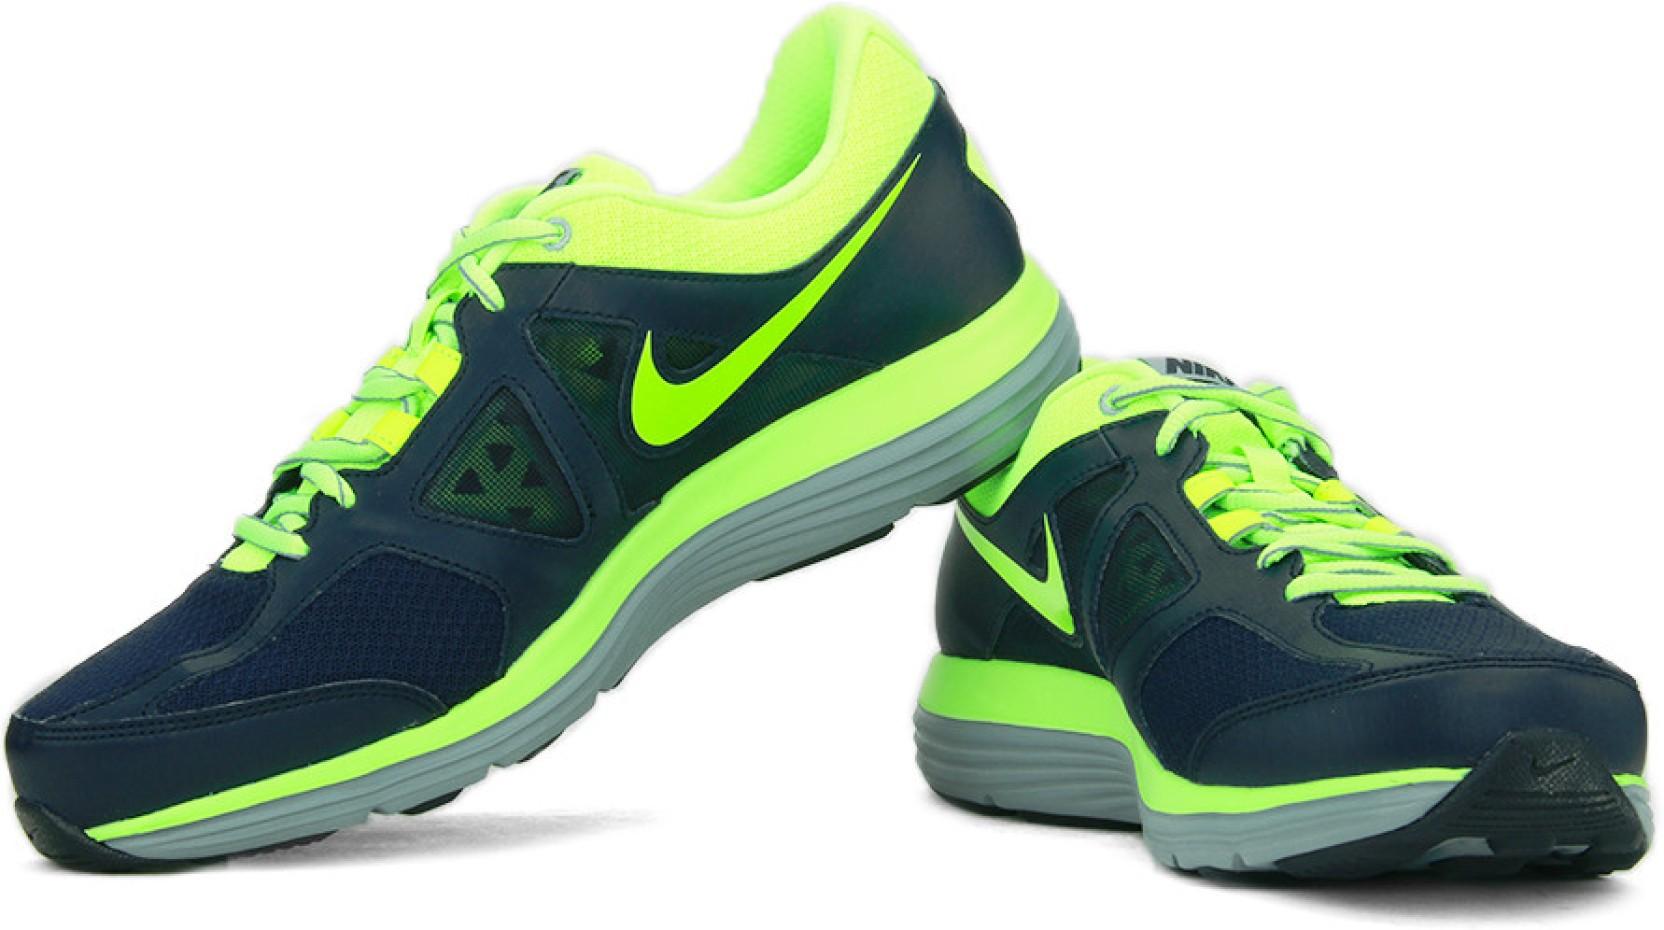 cdfa4591b Nike Dual Fusion Lite 2 MSL Running Shoes For Men - Buy 404 Color ...